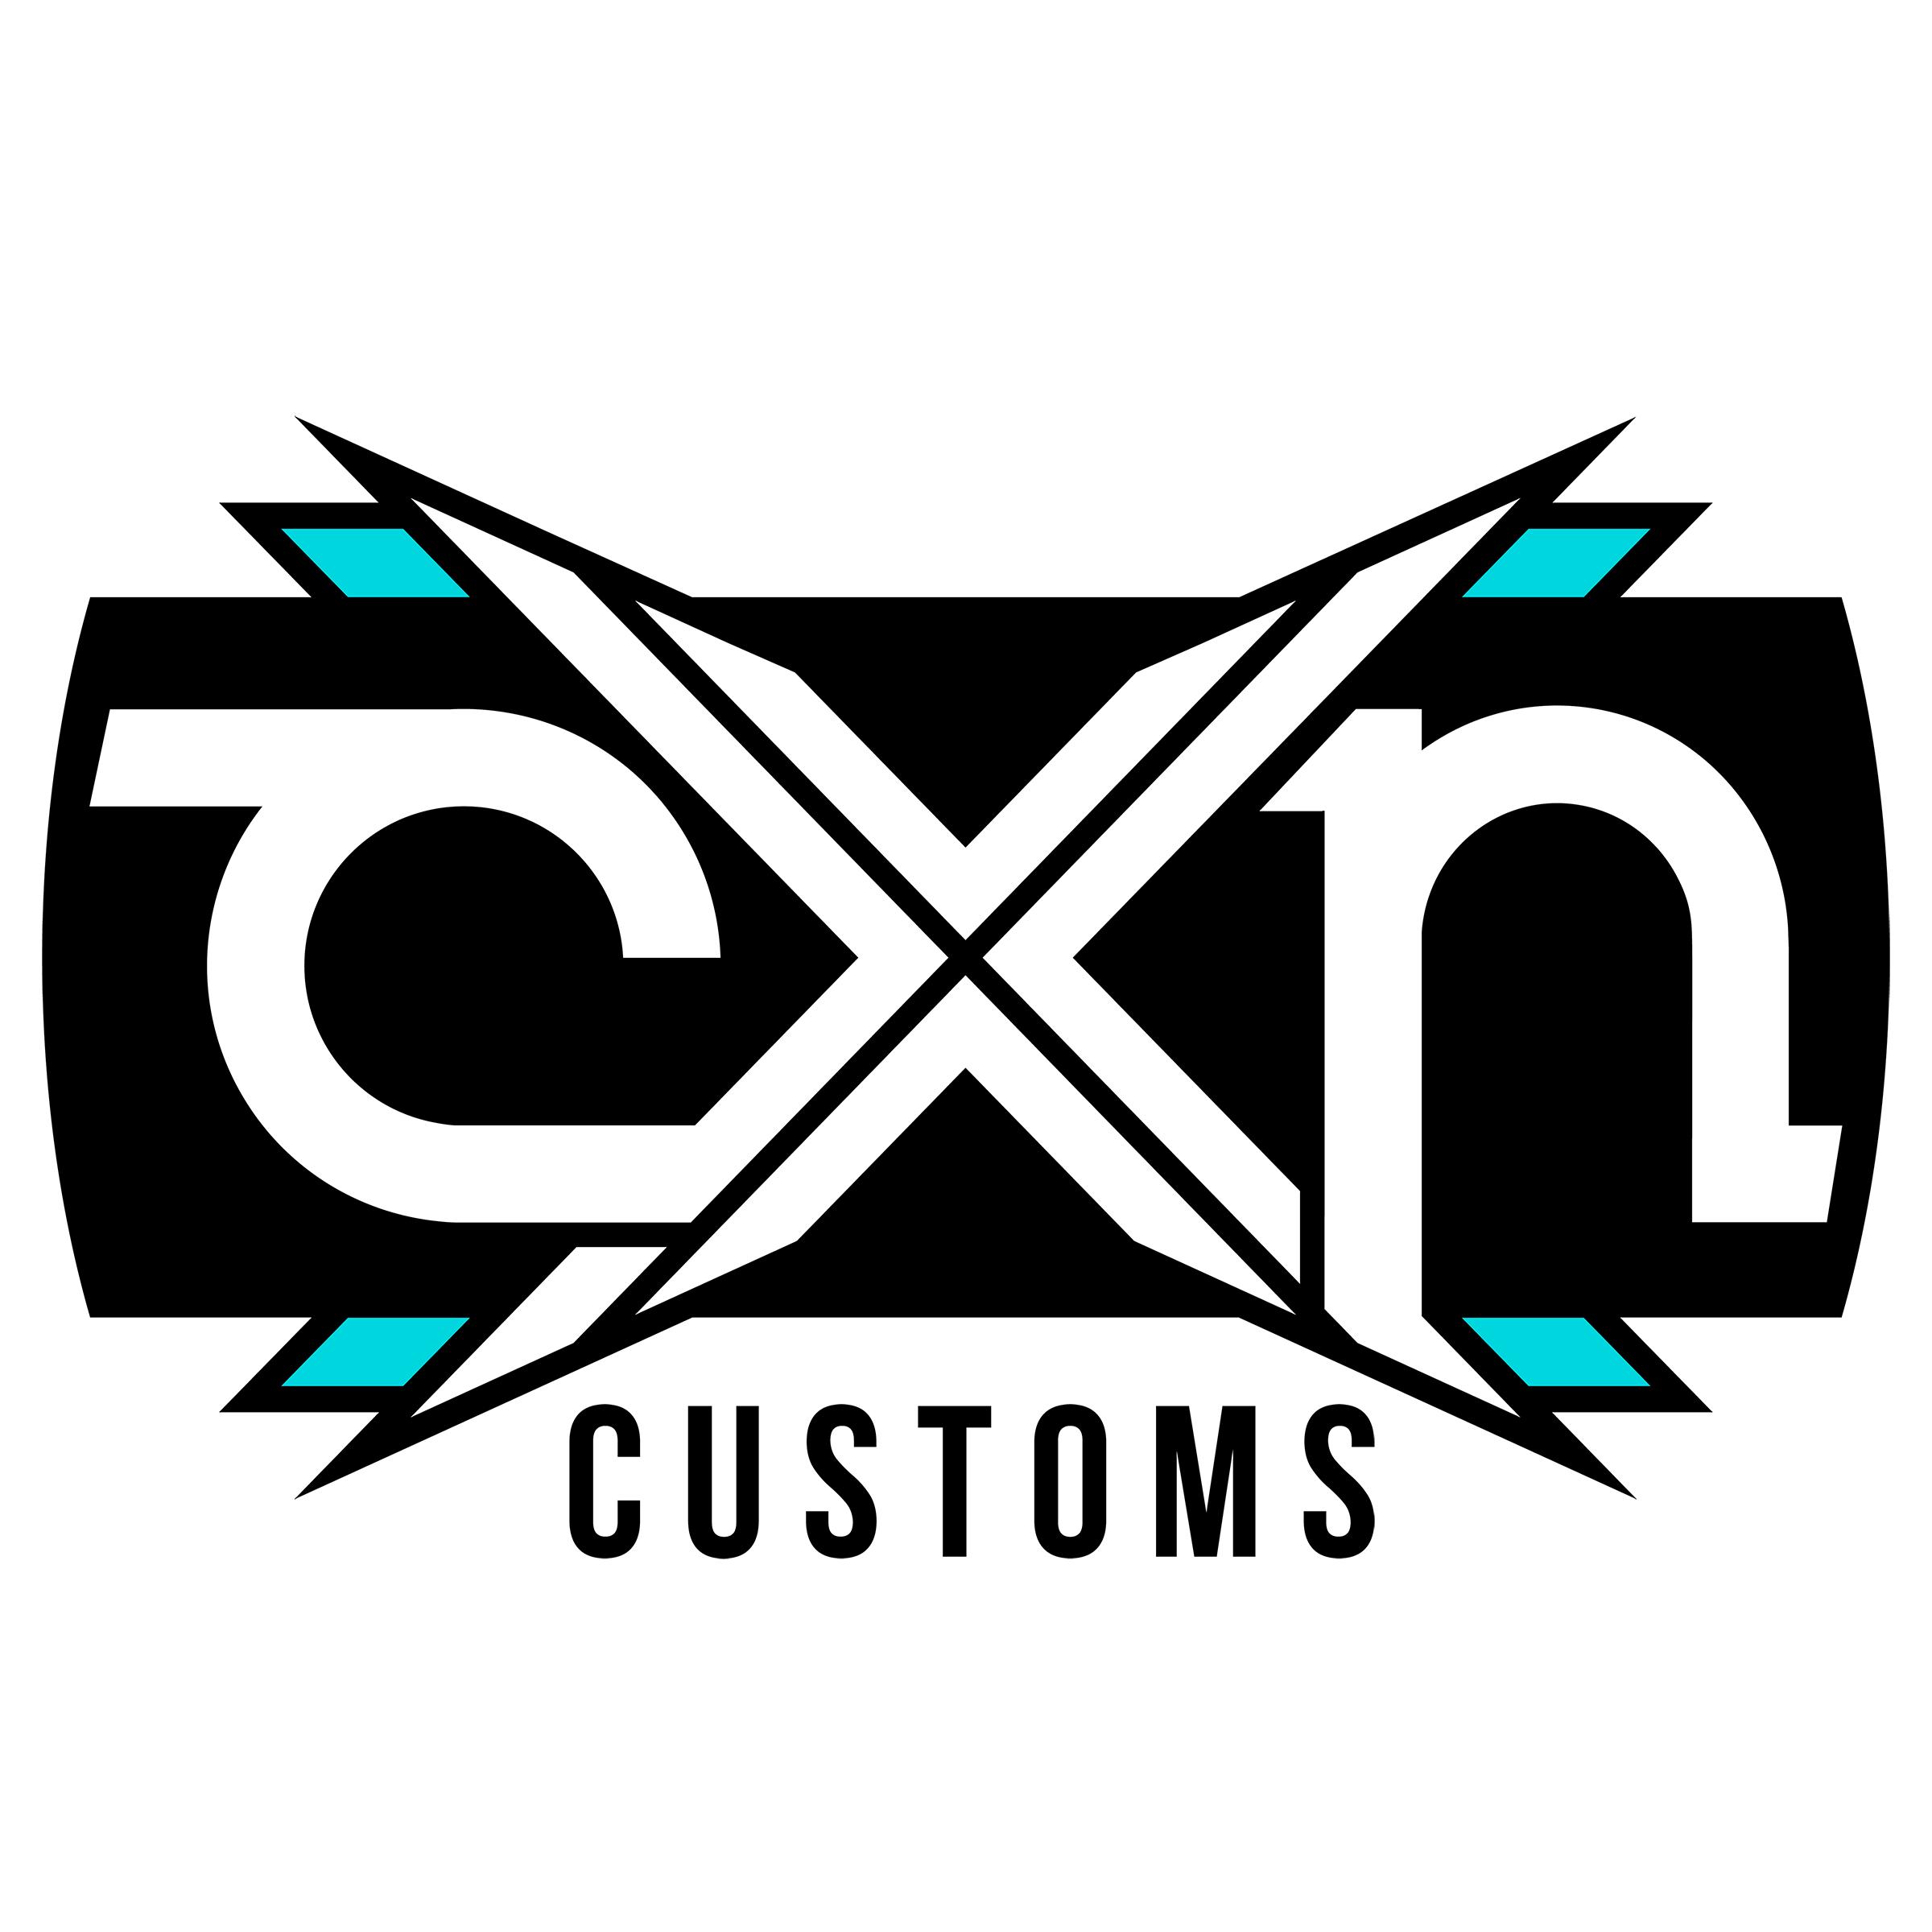 CXN Customs